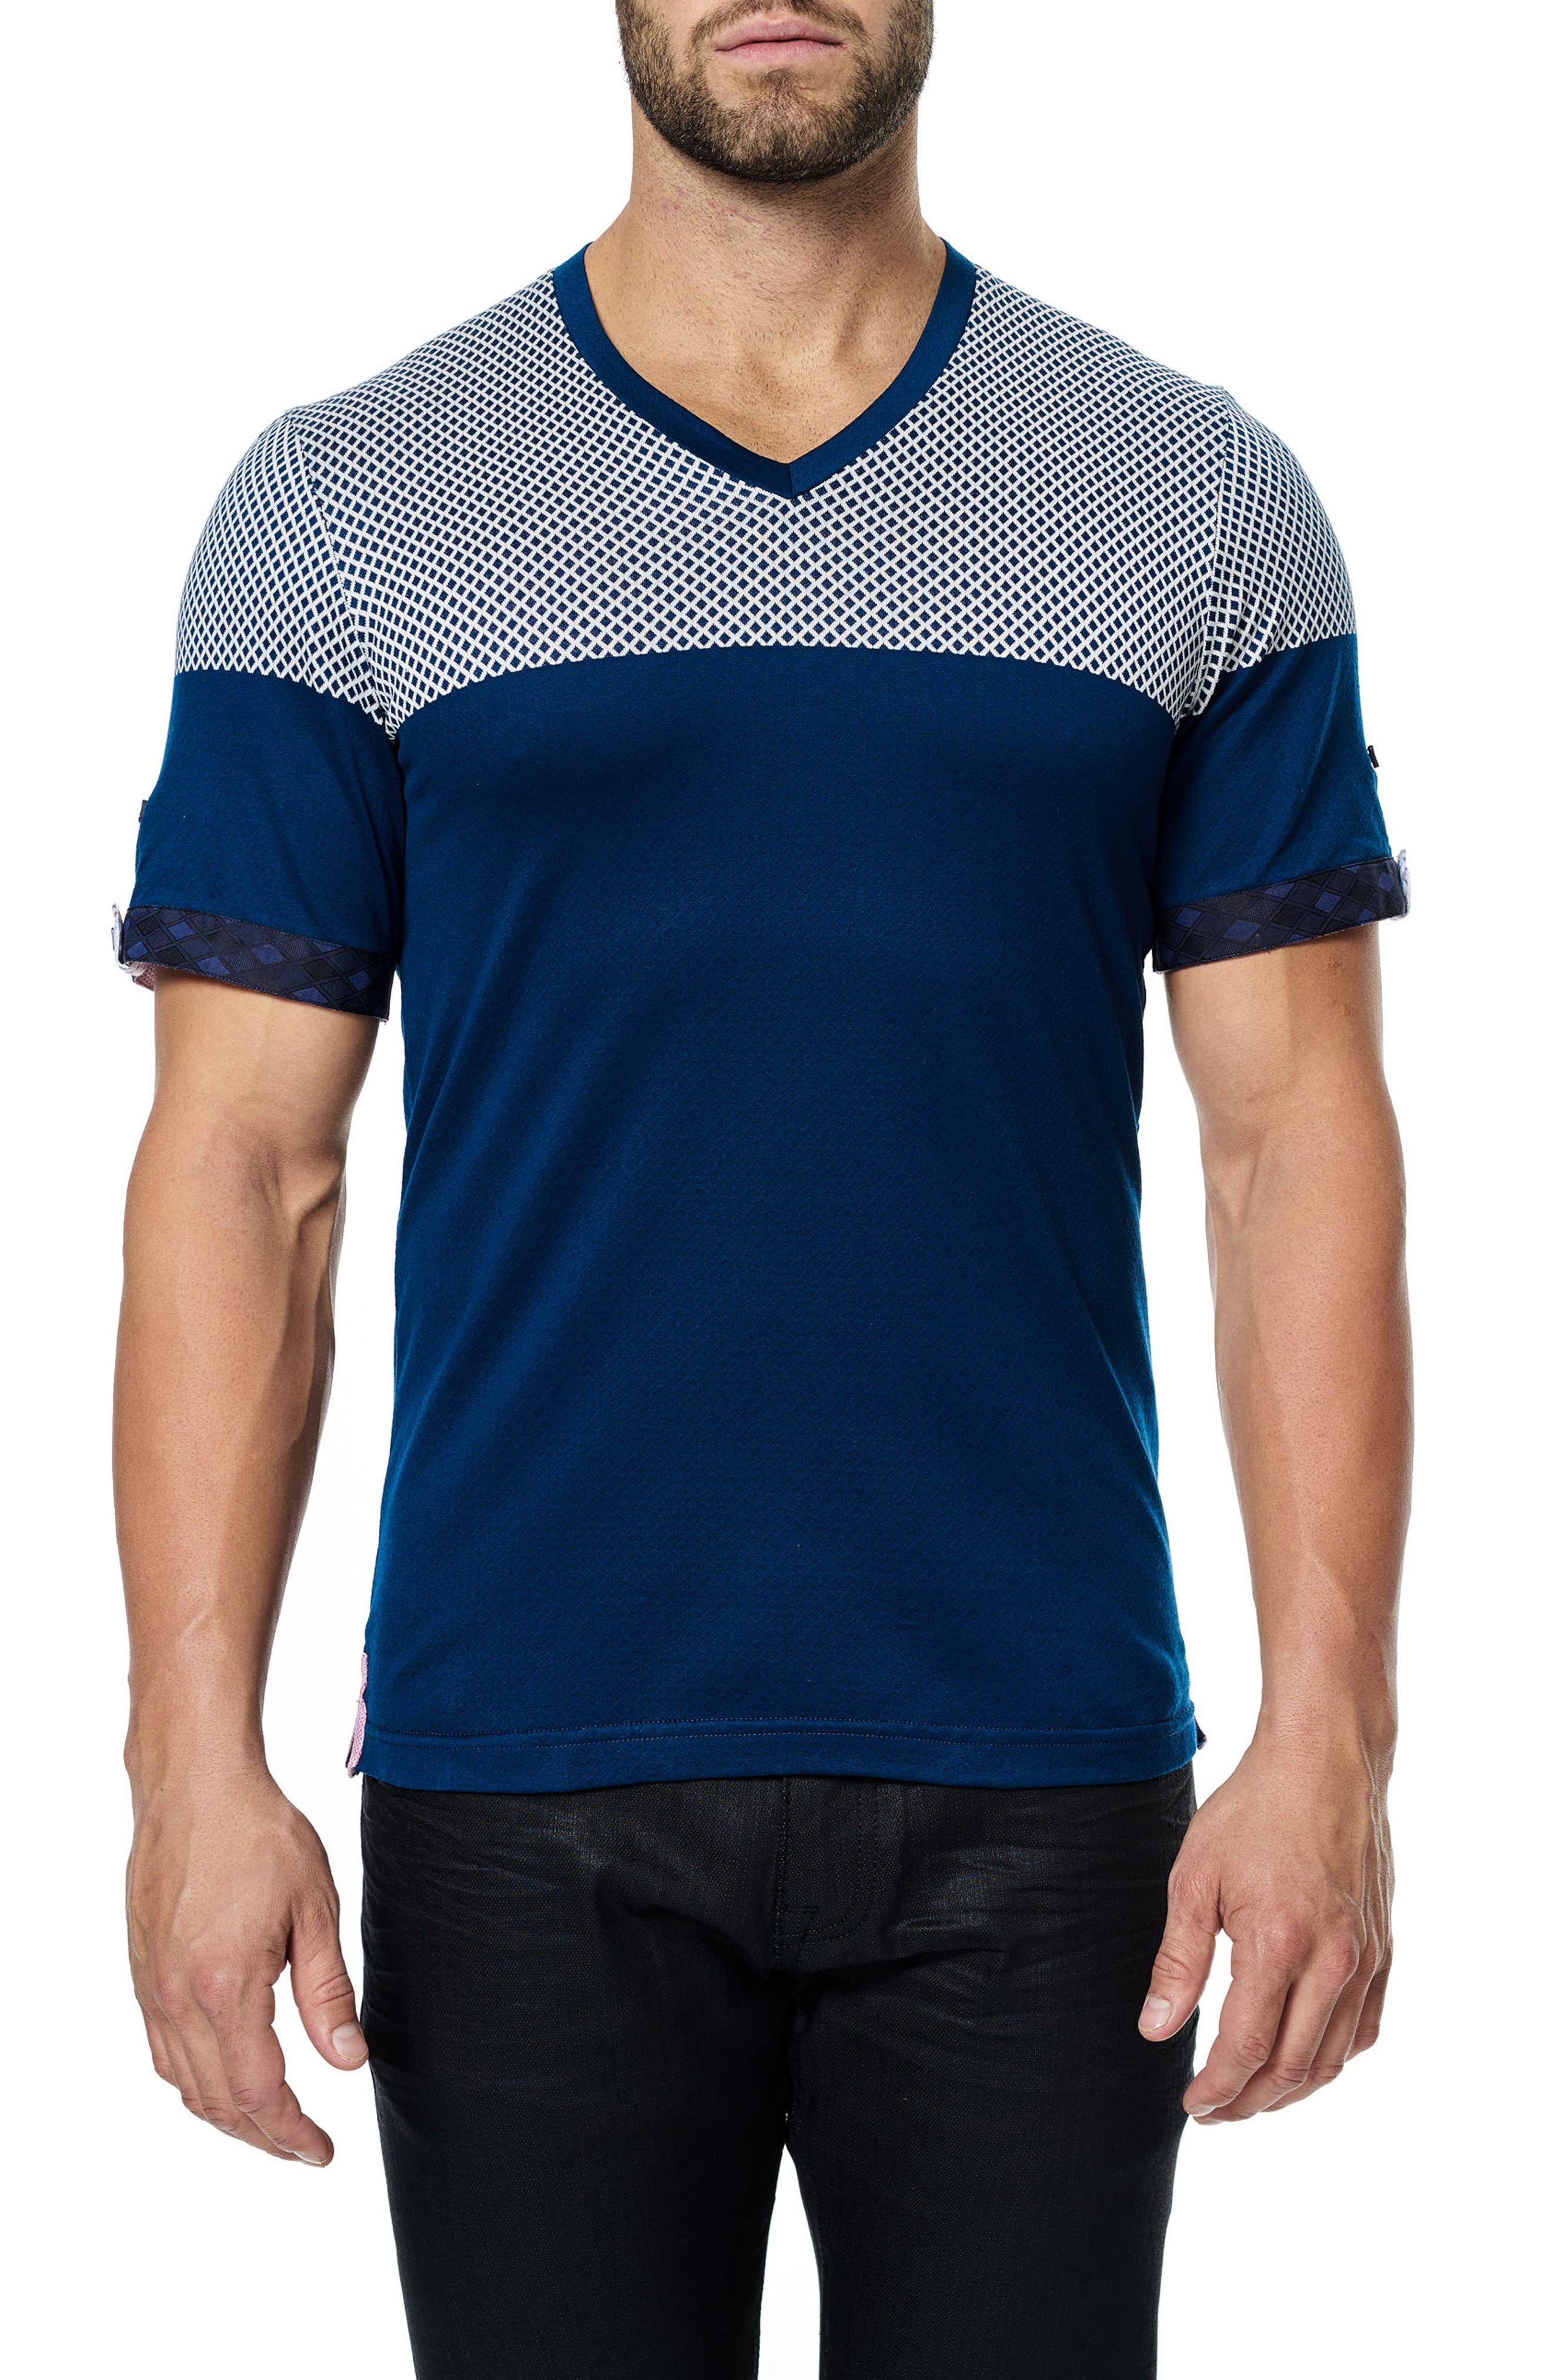 Main Image - Maceoo V-Neck Stretch T-Shirt